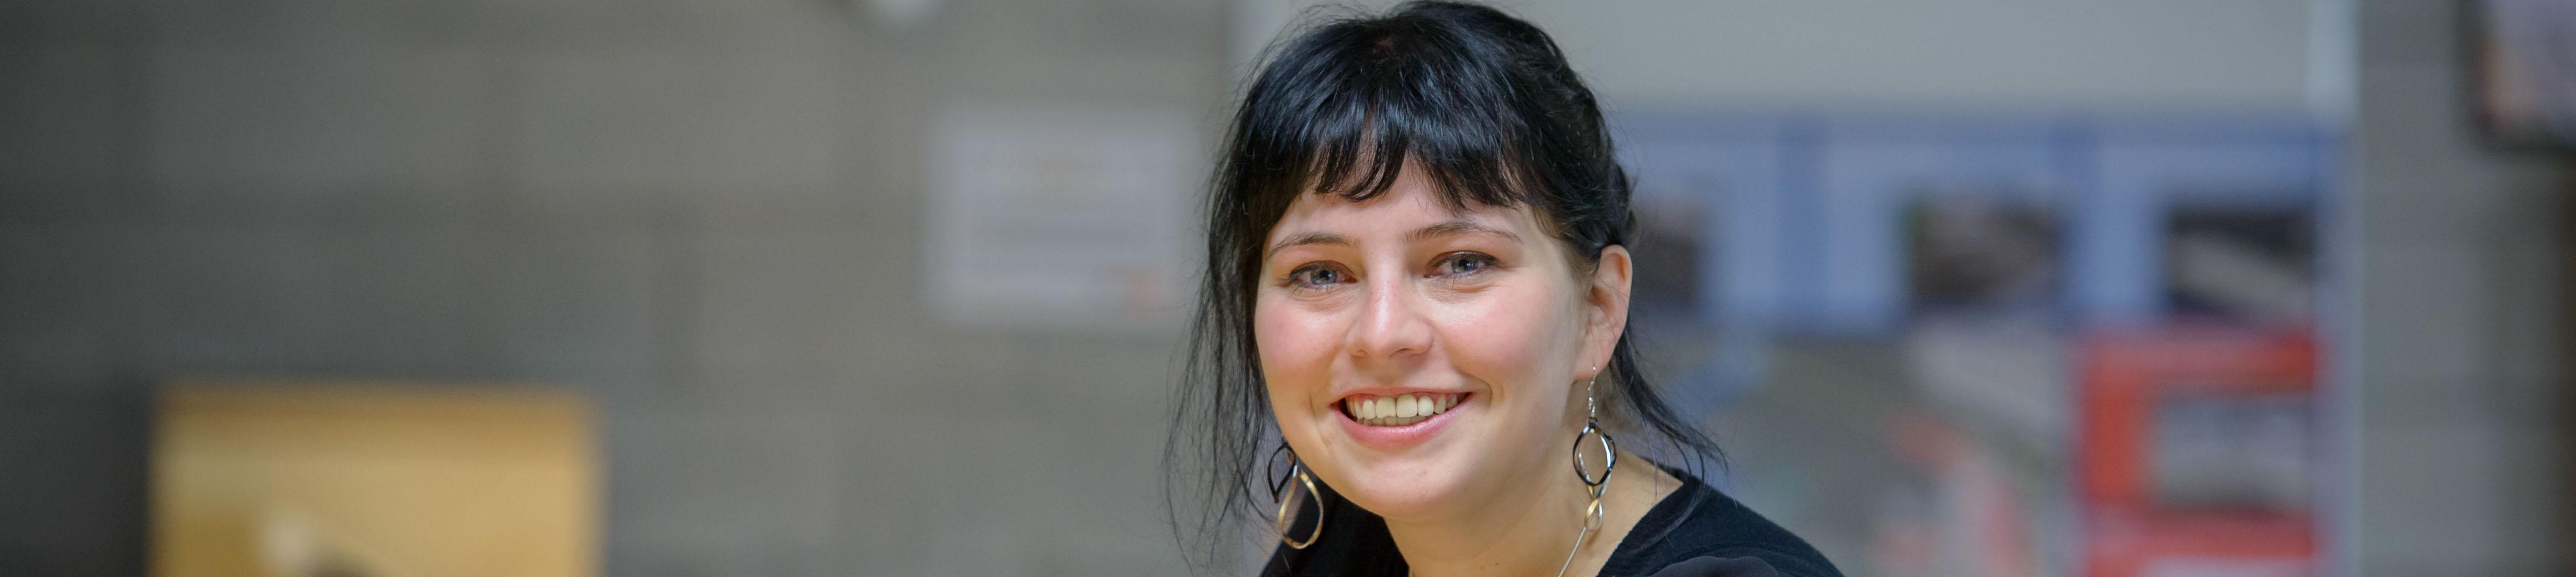 UBC Student Makes Seismic Waves